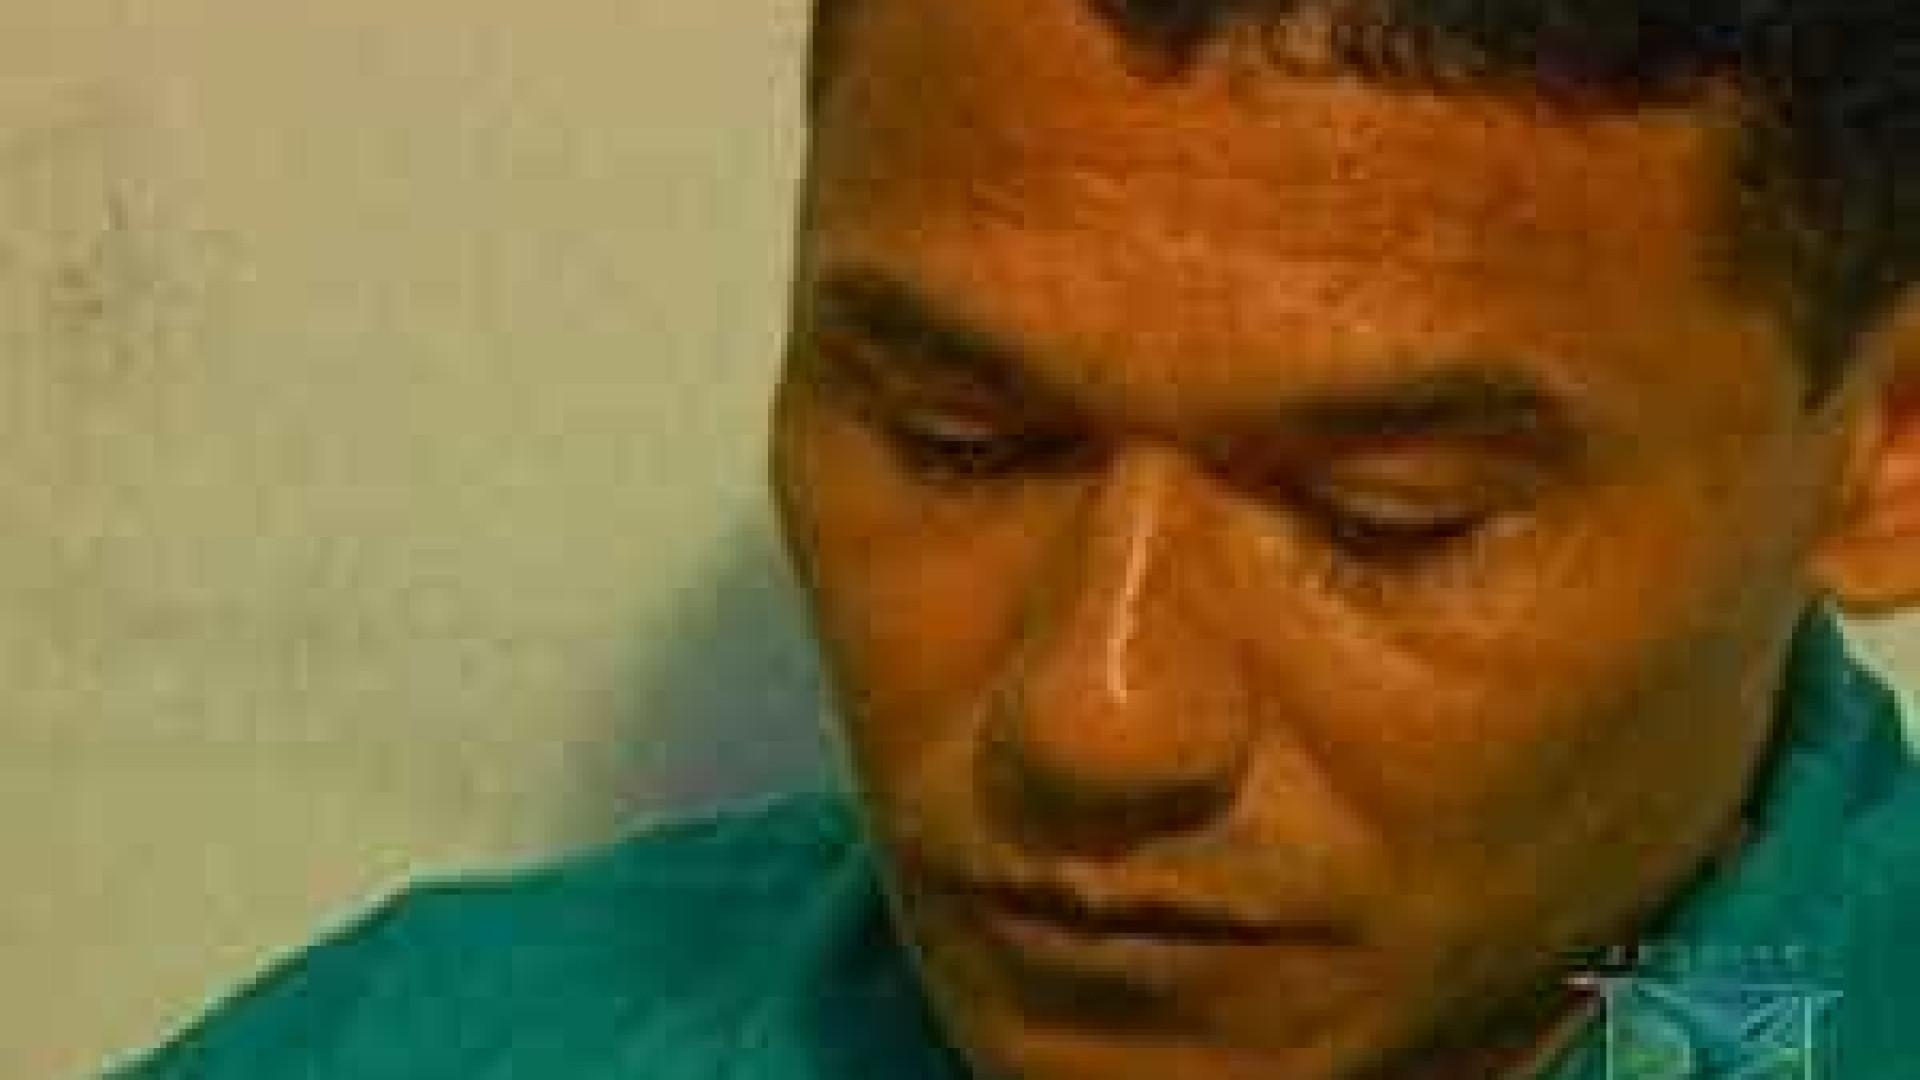 Acusado de matar 42 meninos condenado a 108 anos de prisão